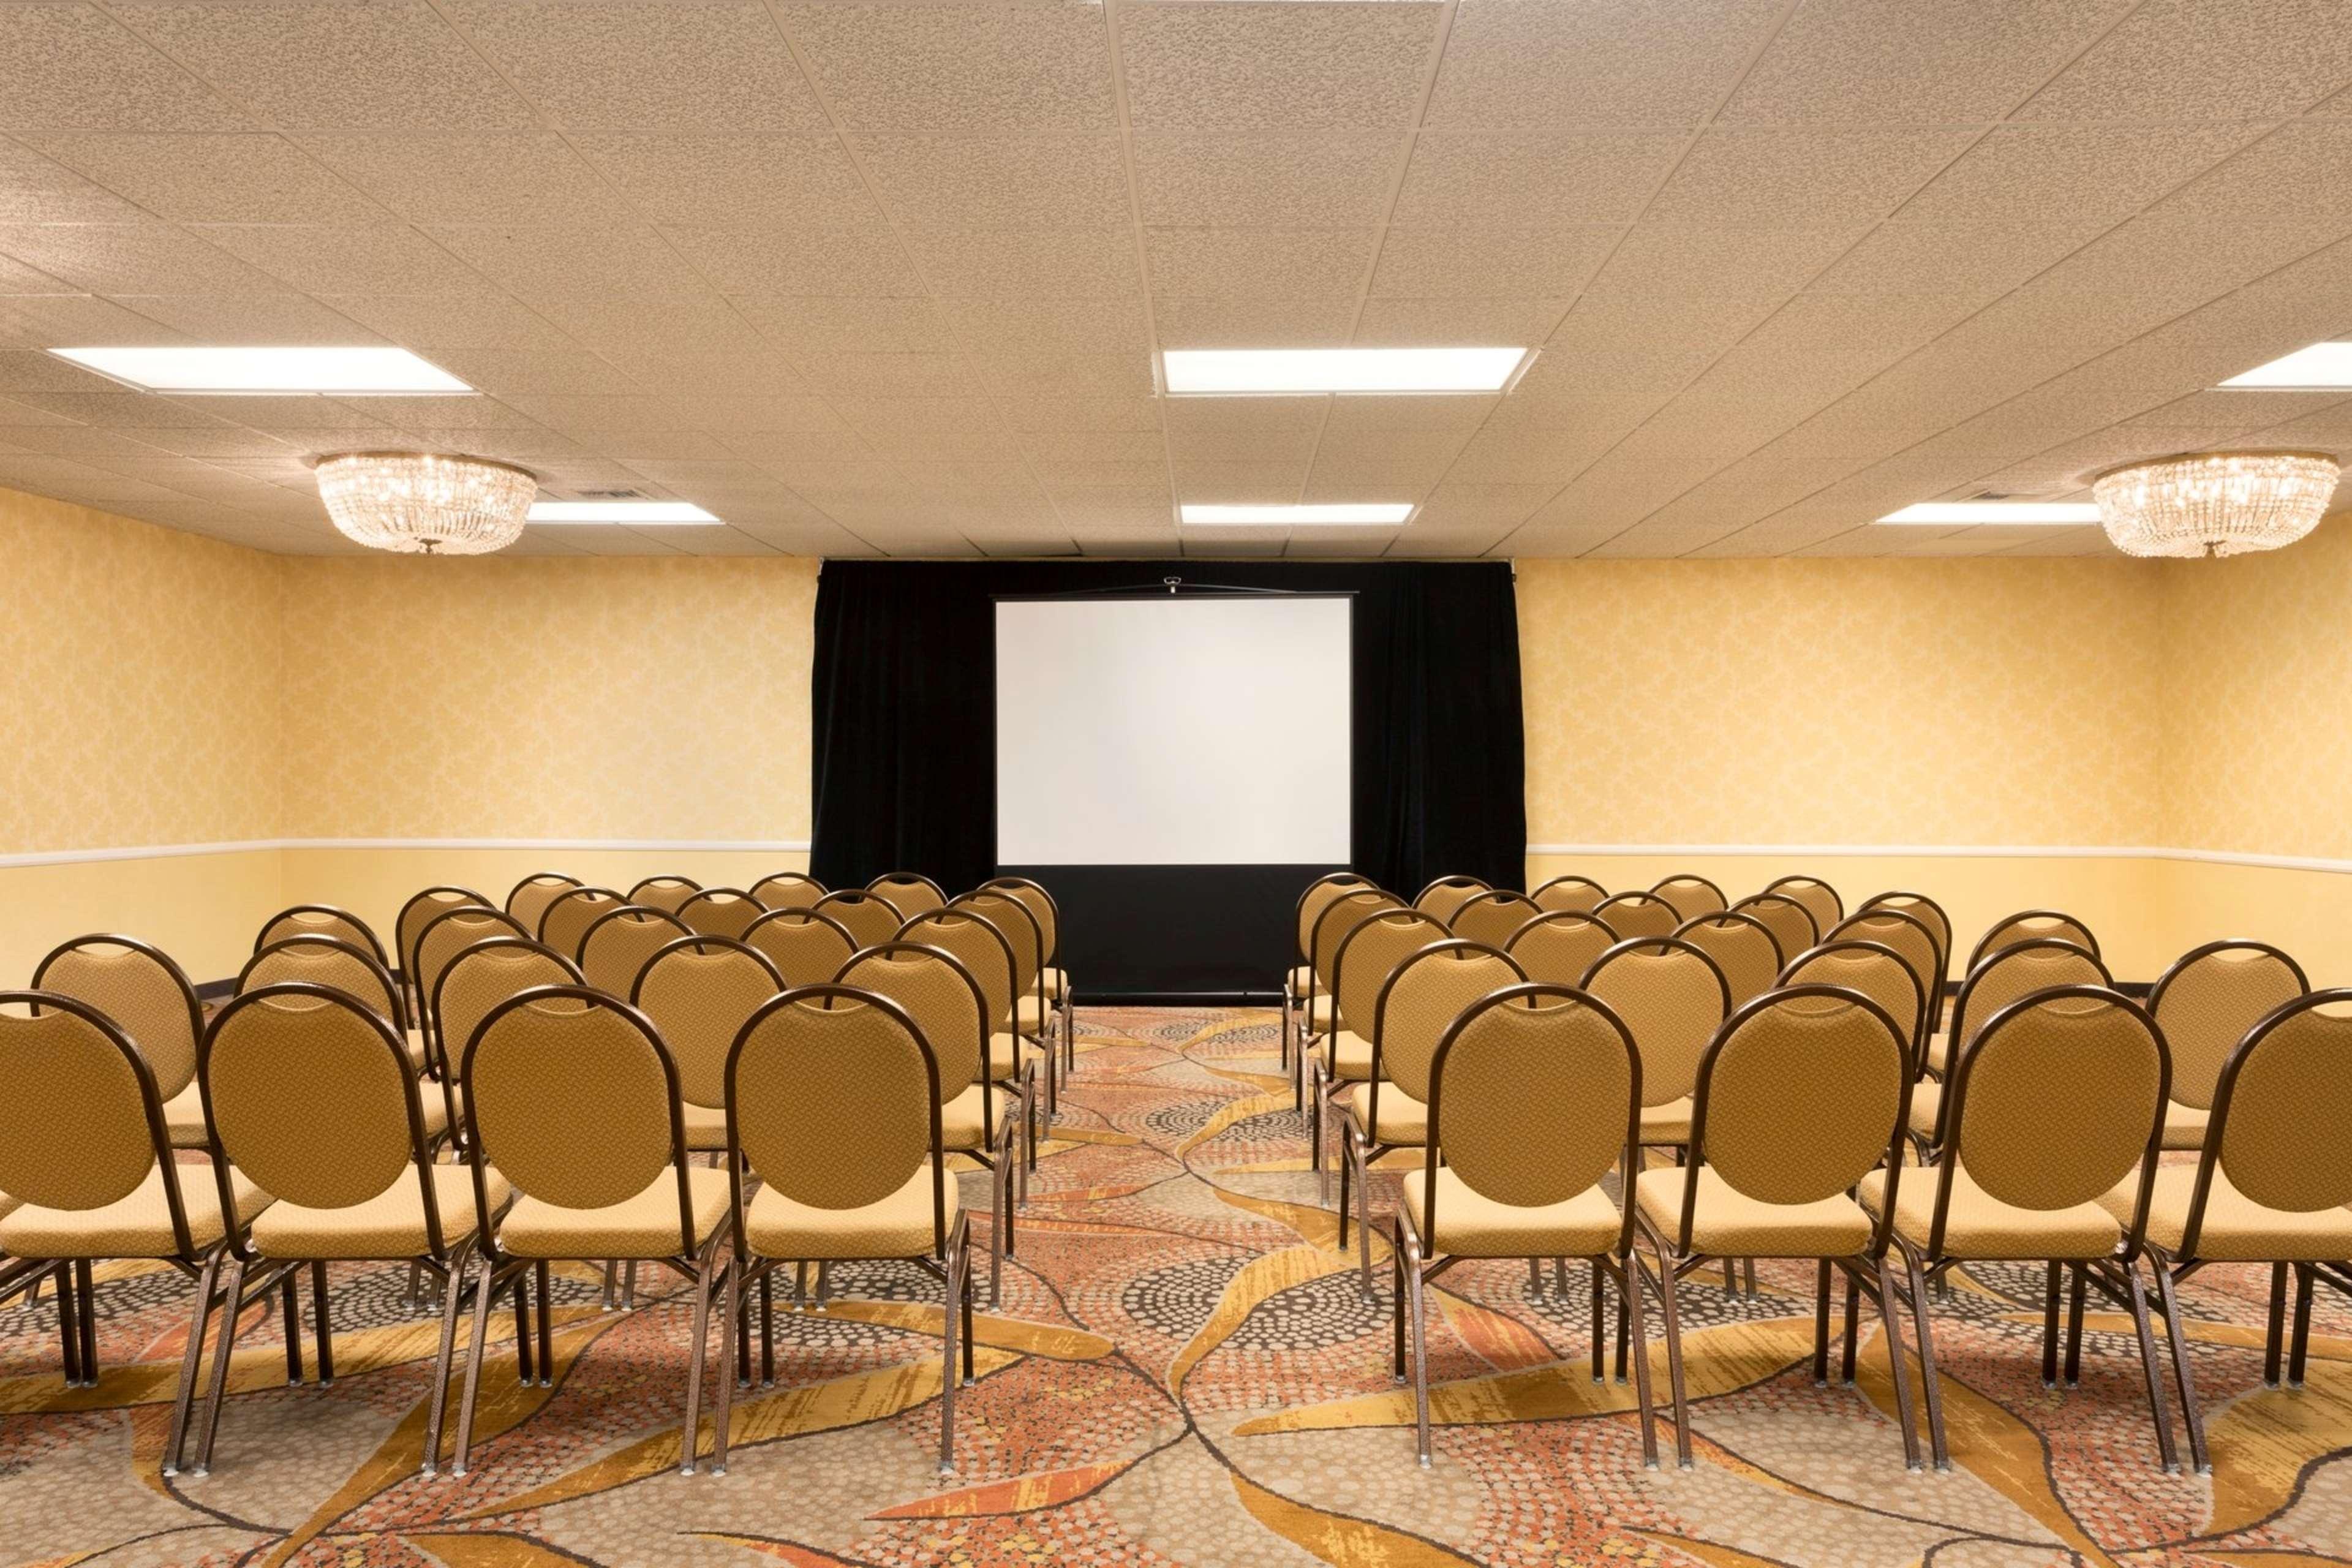 Embassy Suites by Hilton Arcadia Pasadena Area image 33